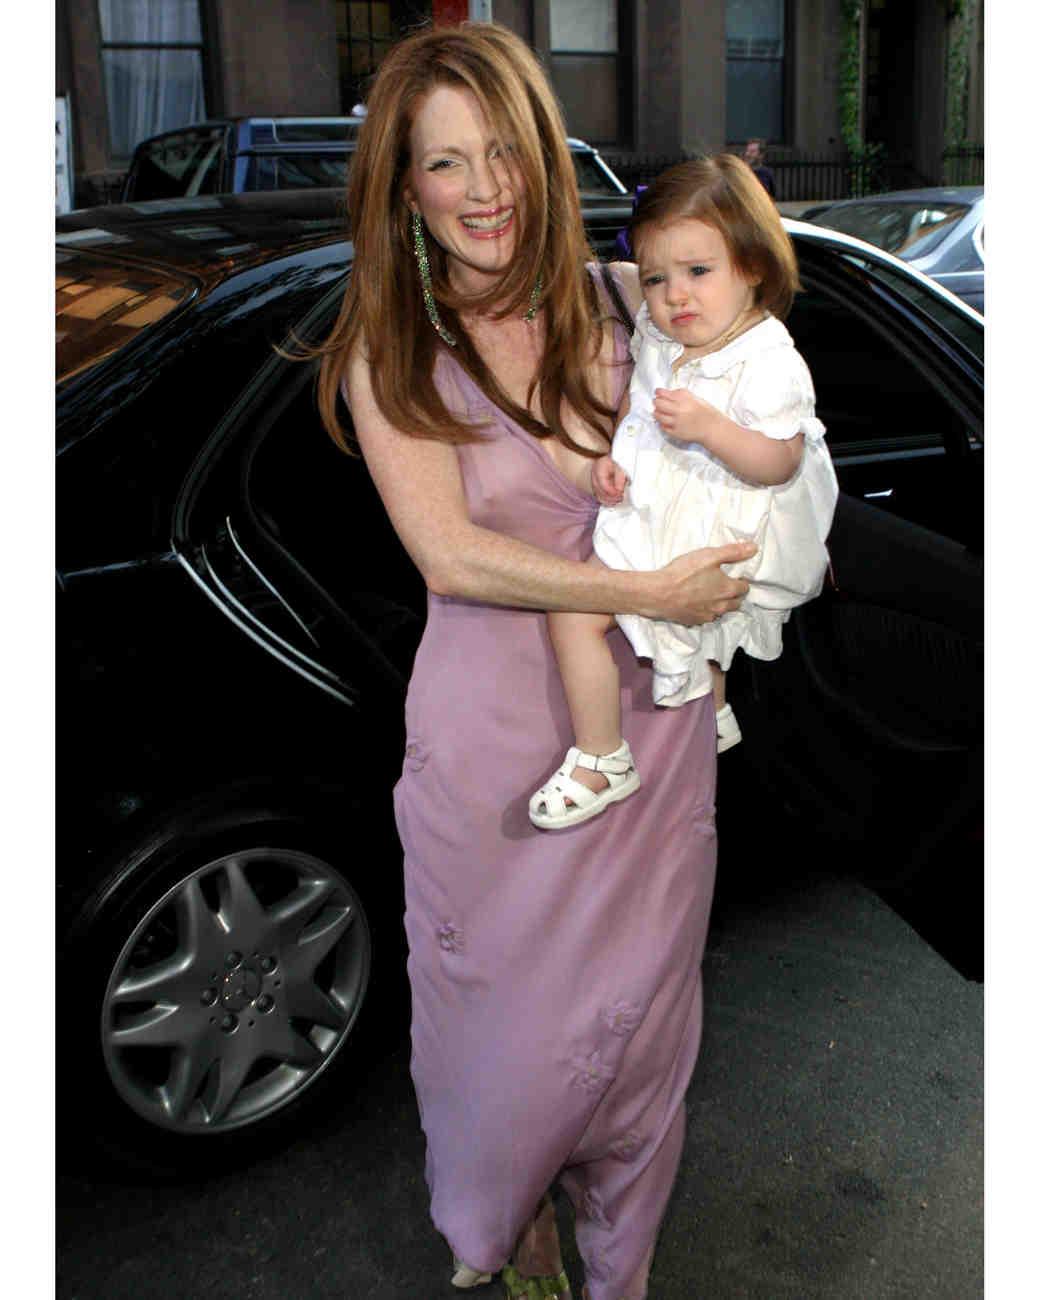 celebrity-pink-wedding-dresses-julianne-moore-gettyimages-182318326-0815.jpg